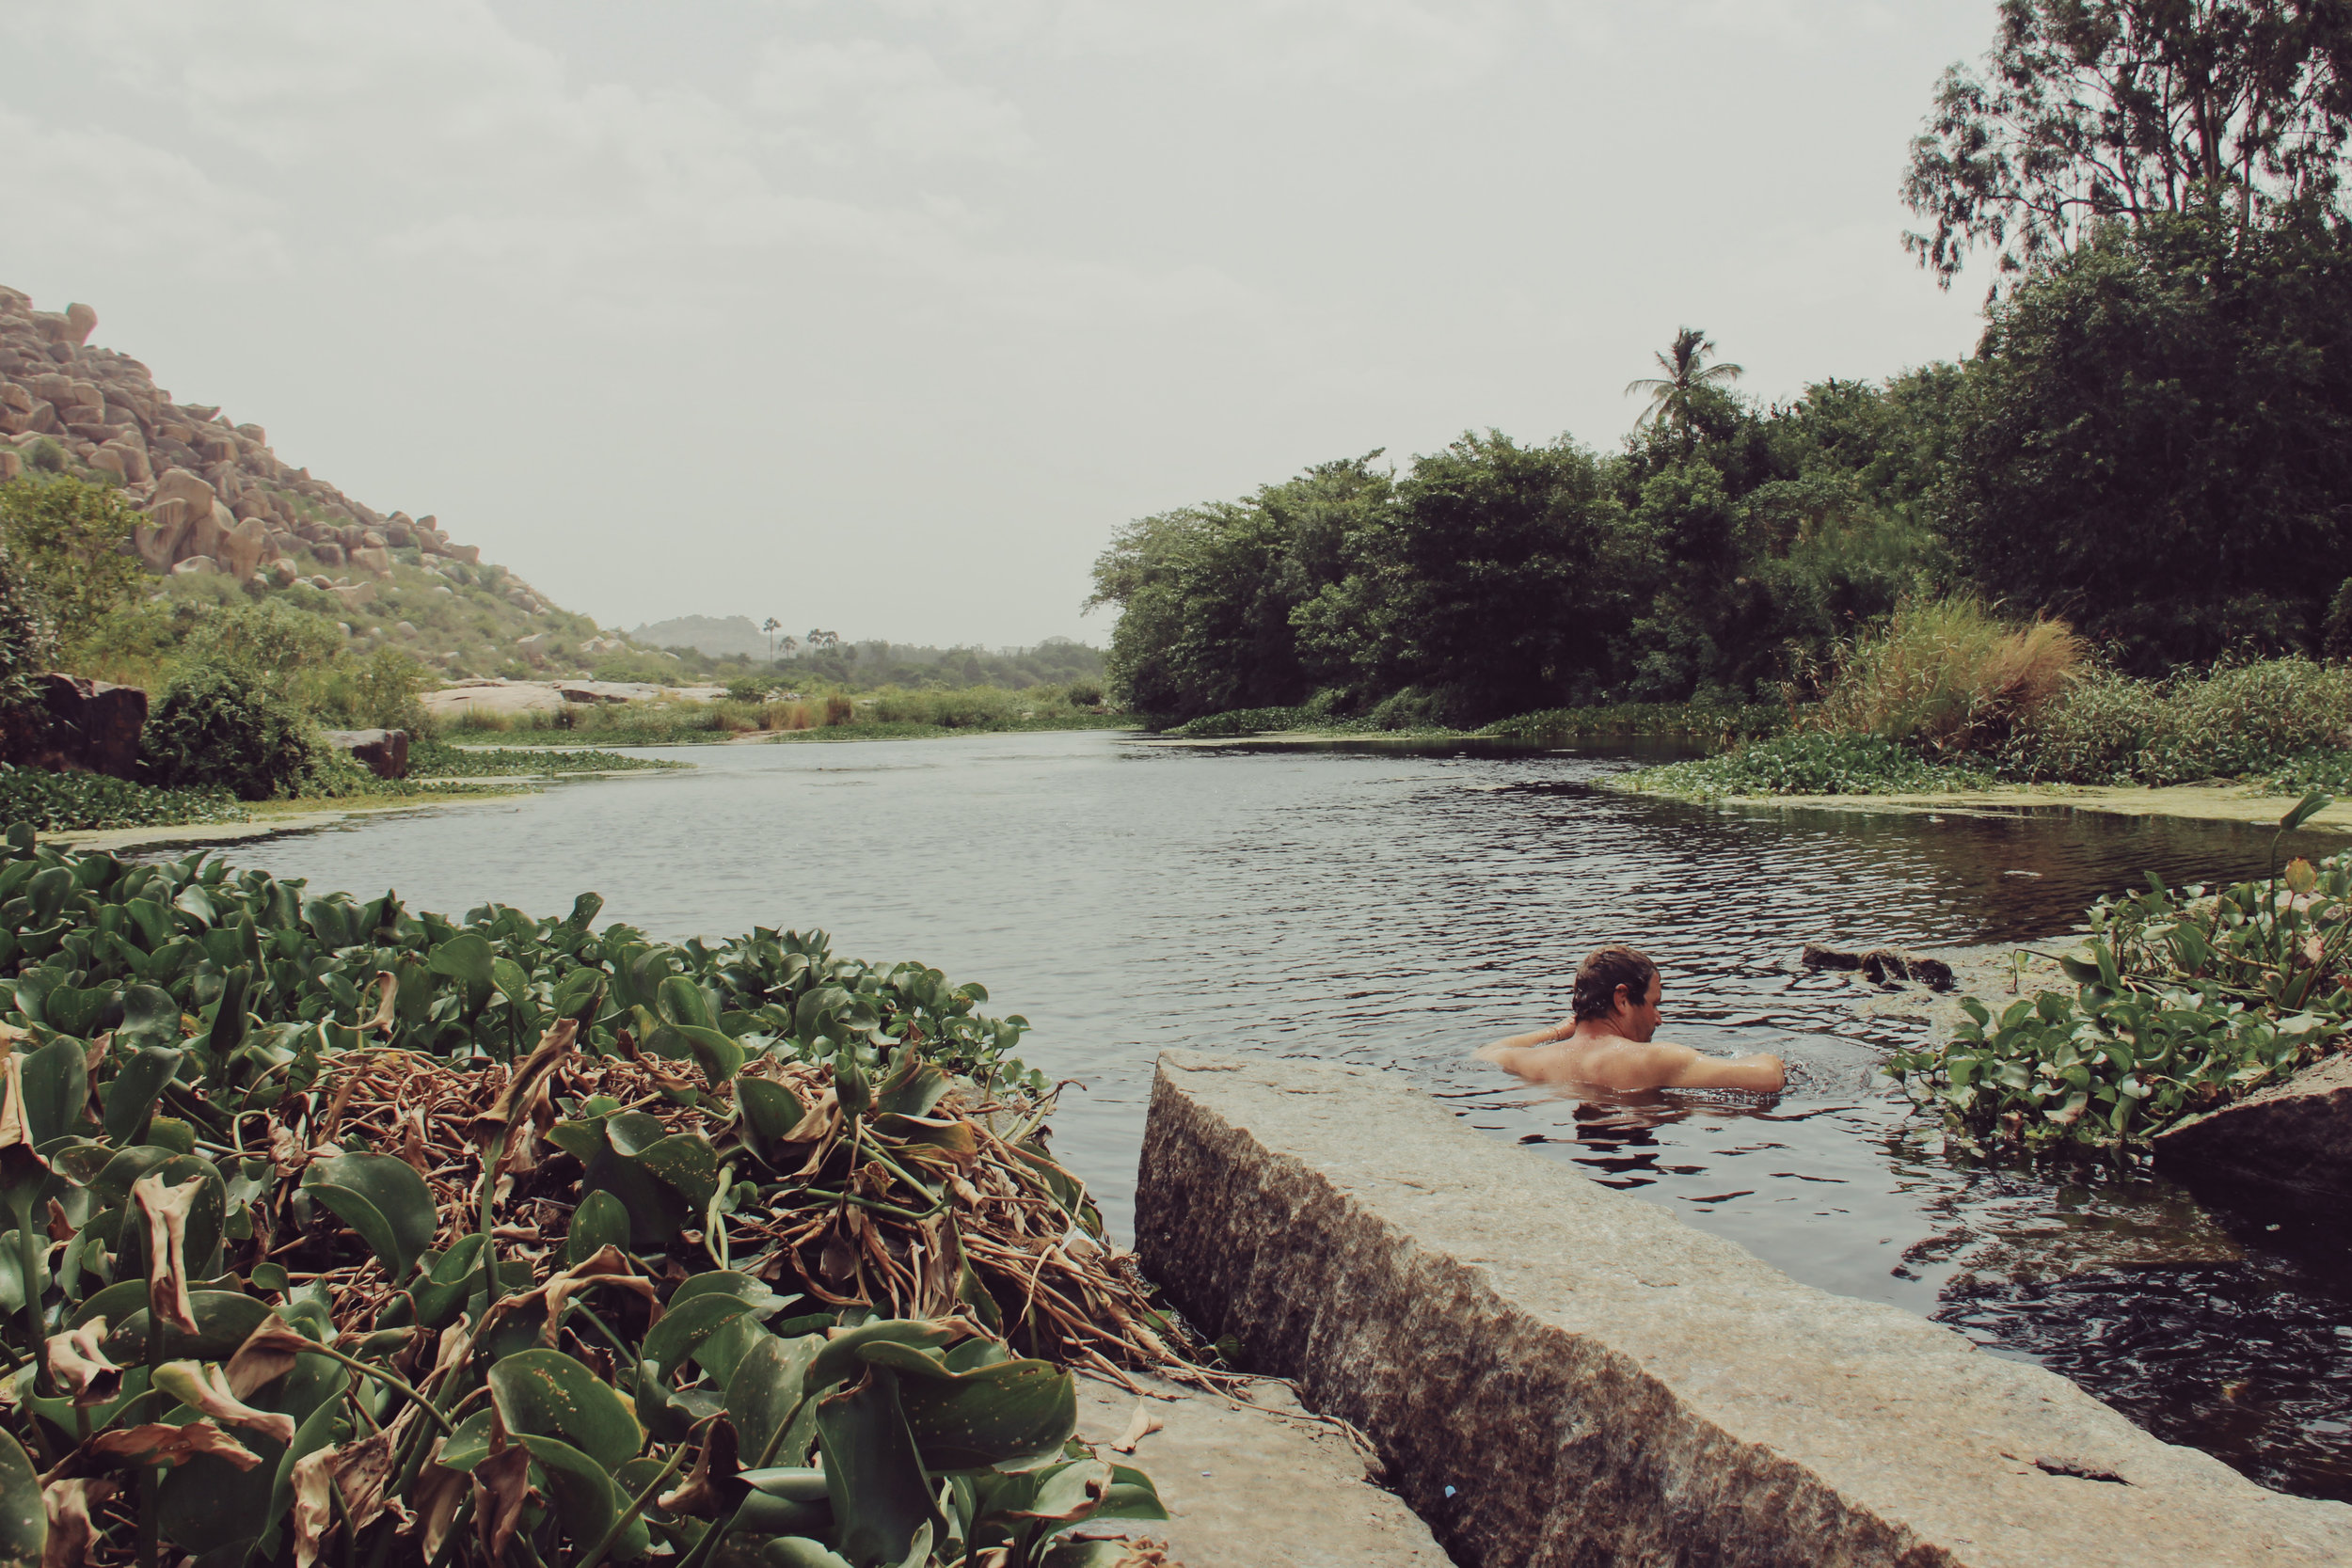 Taking a dip in the Tungabhadra River in Hampi.